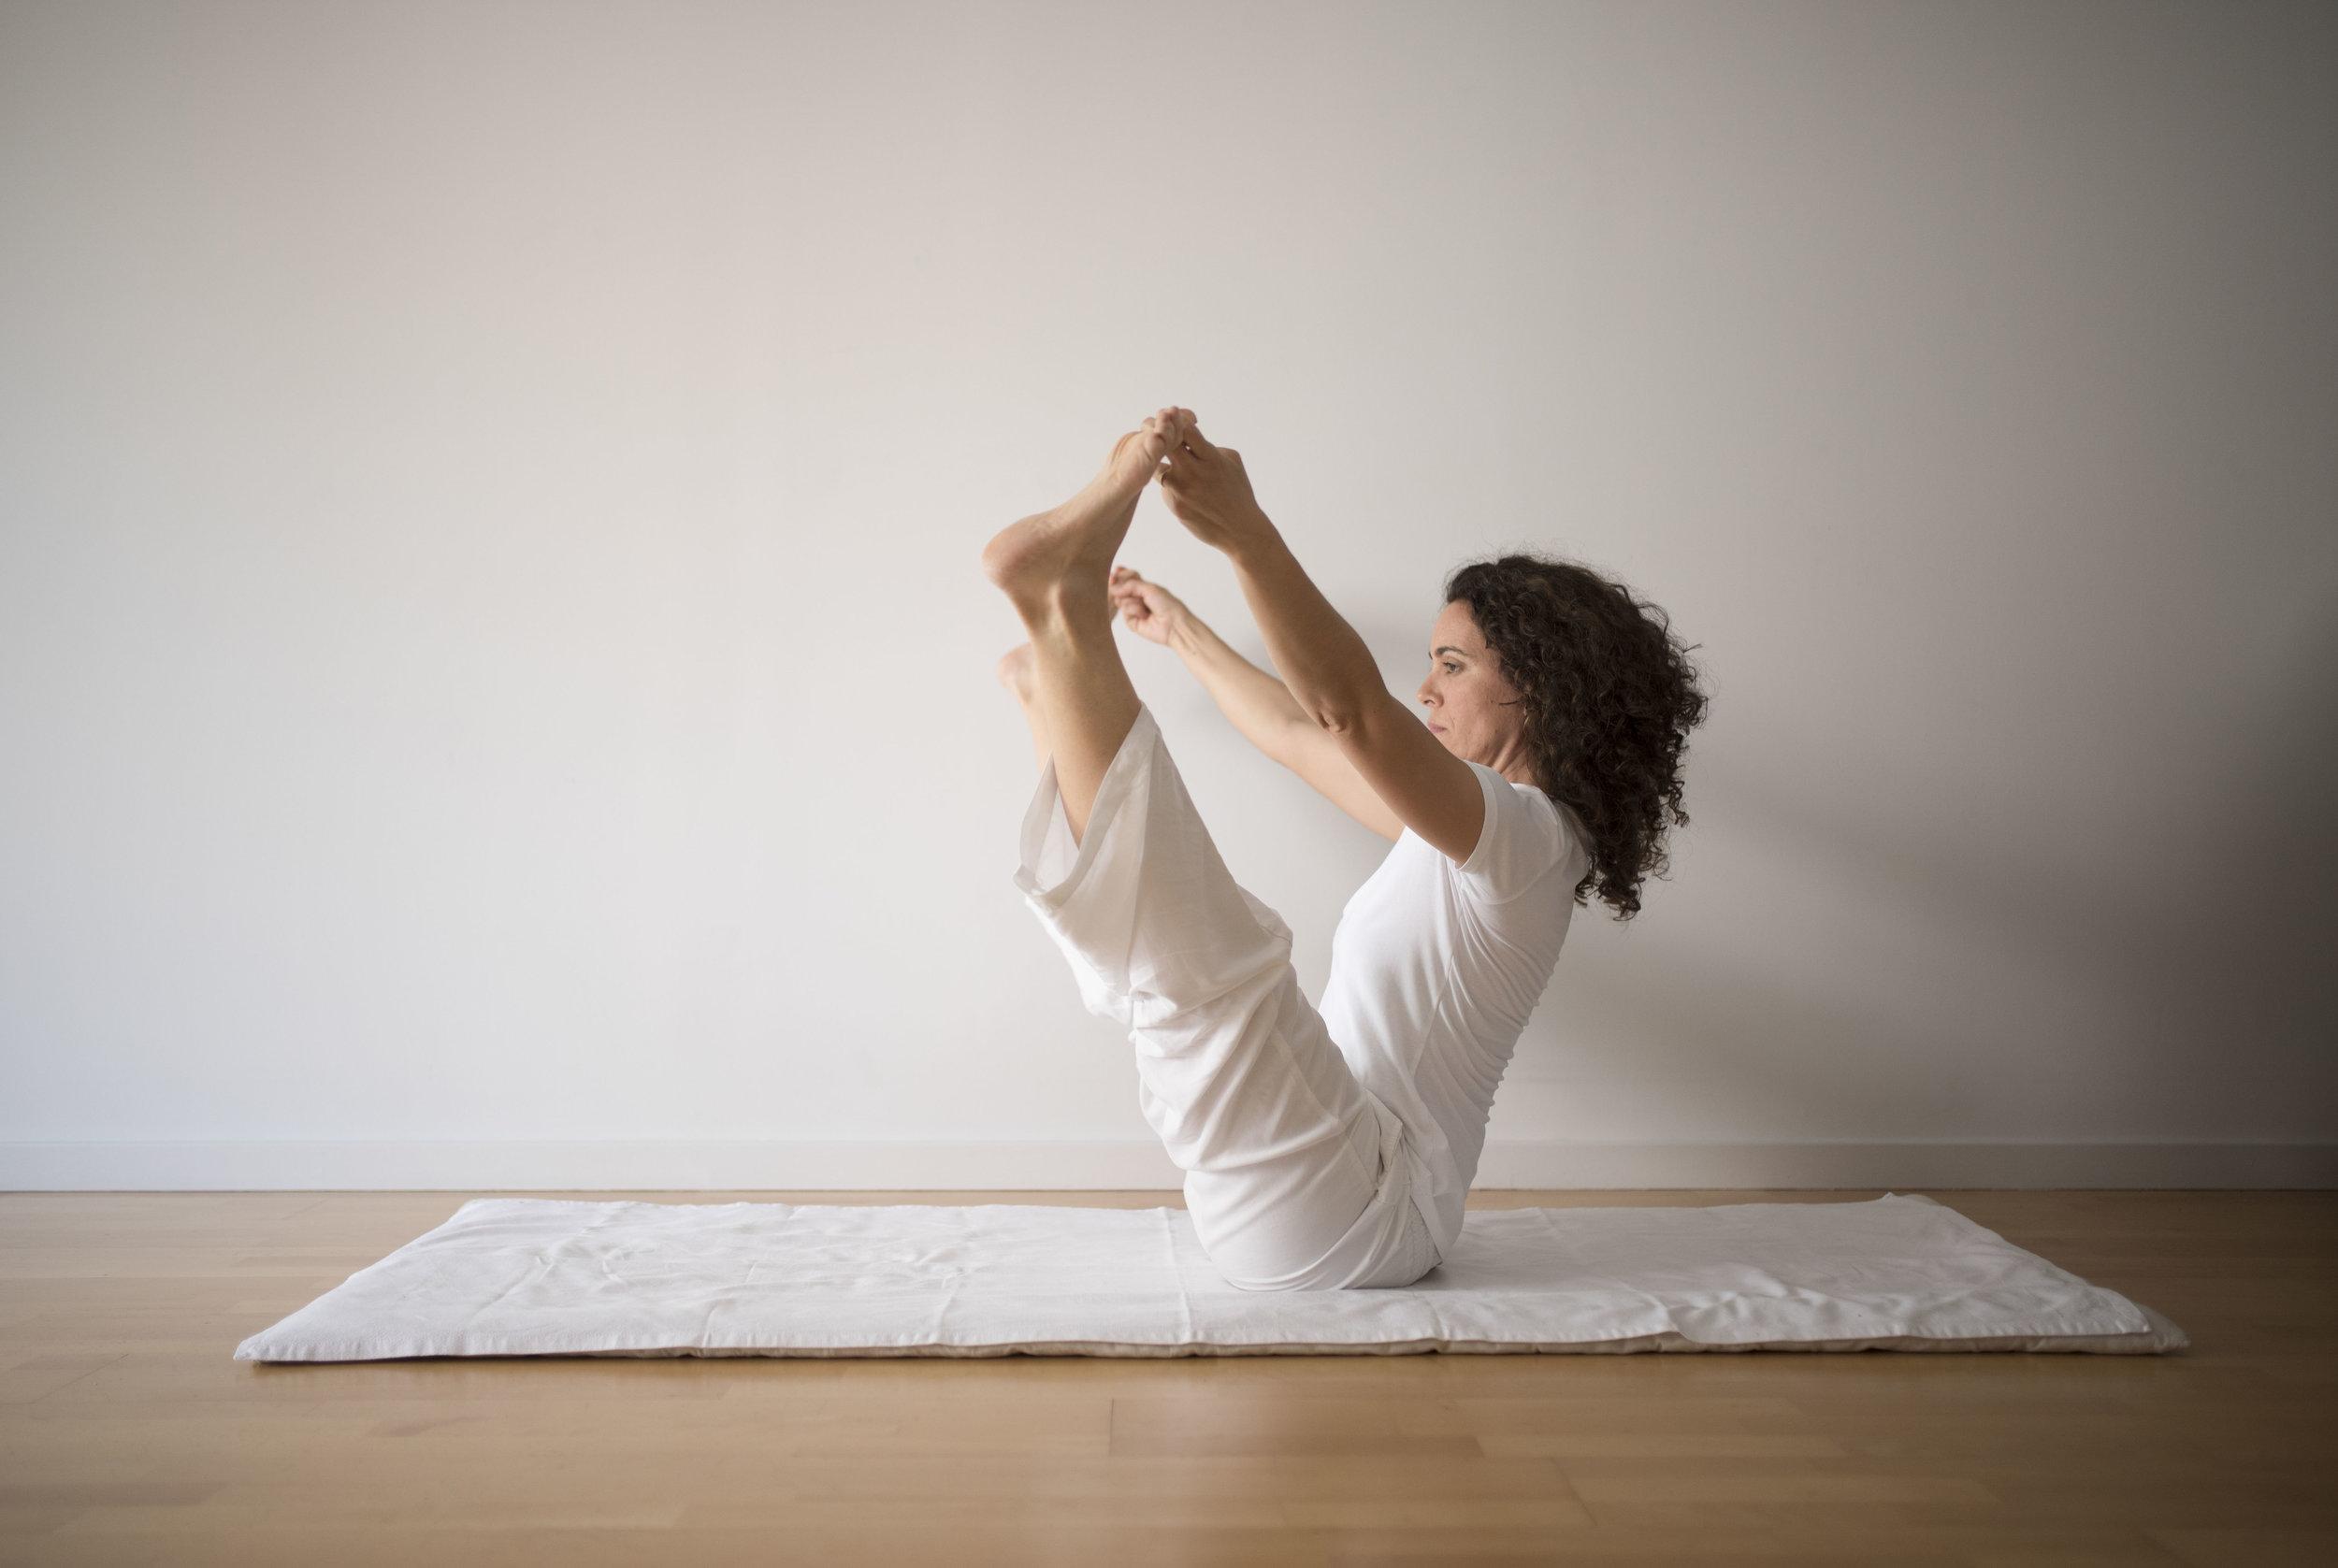 Nuria-Chalamanch_yoga_2018-06-01_gilbertbages_37.JPG